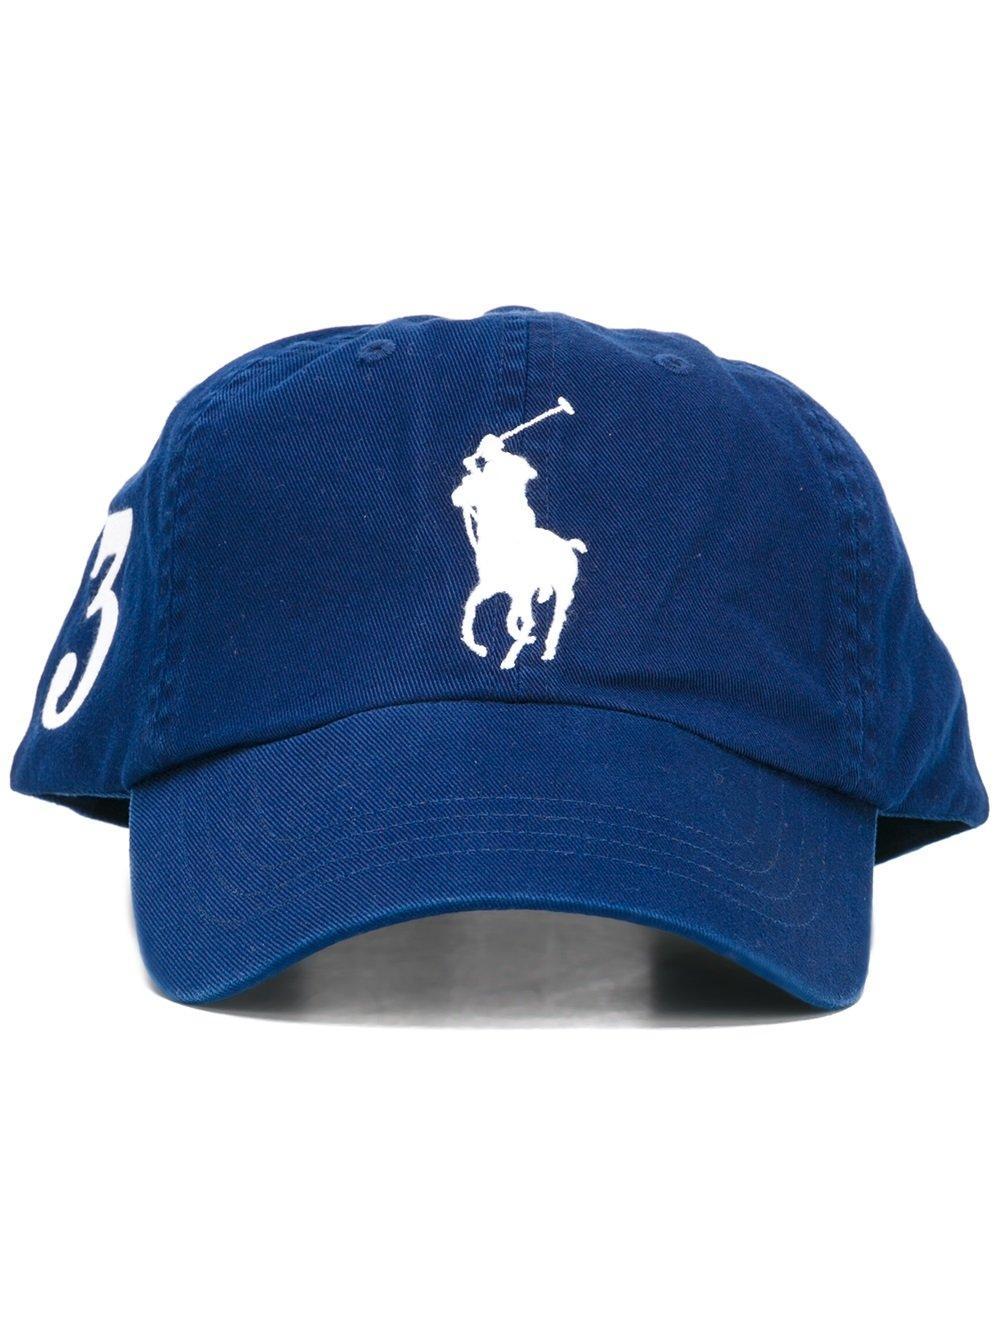 lyst polo ralph lauren big pony baseball cap in blue for men. Black Bedroom Furniture Sets. Home Design Ideas